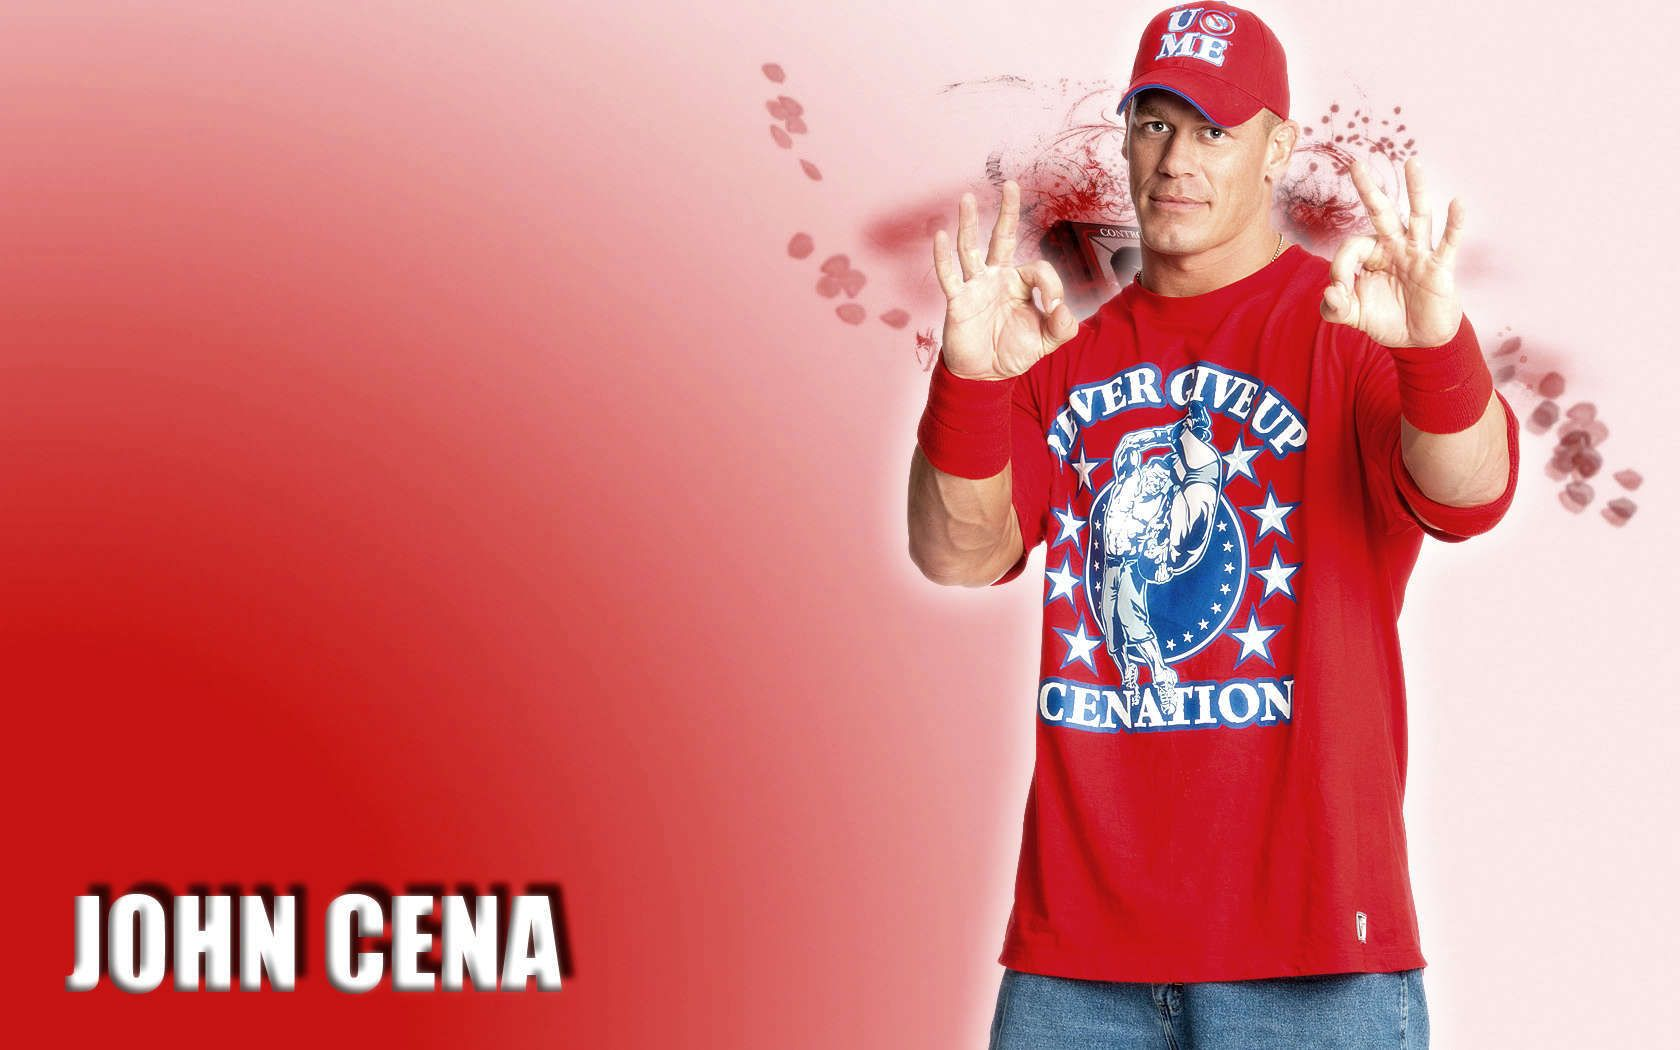 Pin By Wallpaper Idol On Hd Wallpapers Wwe Superstar John Cena